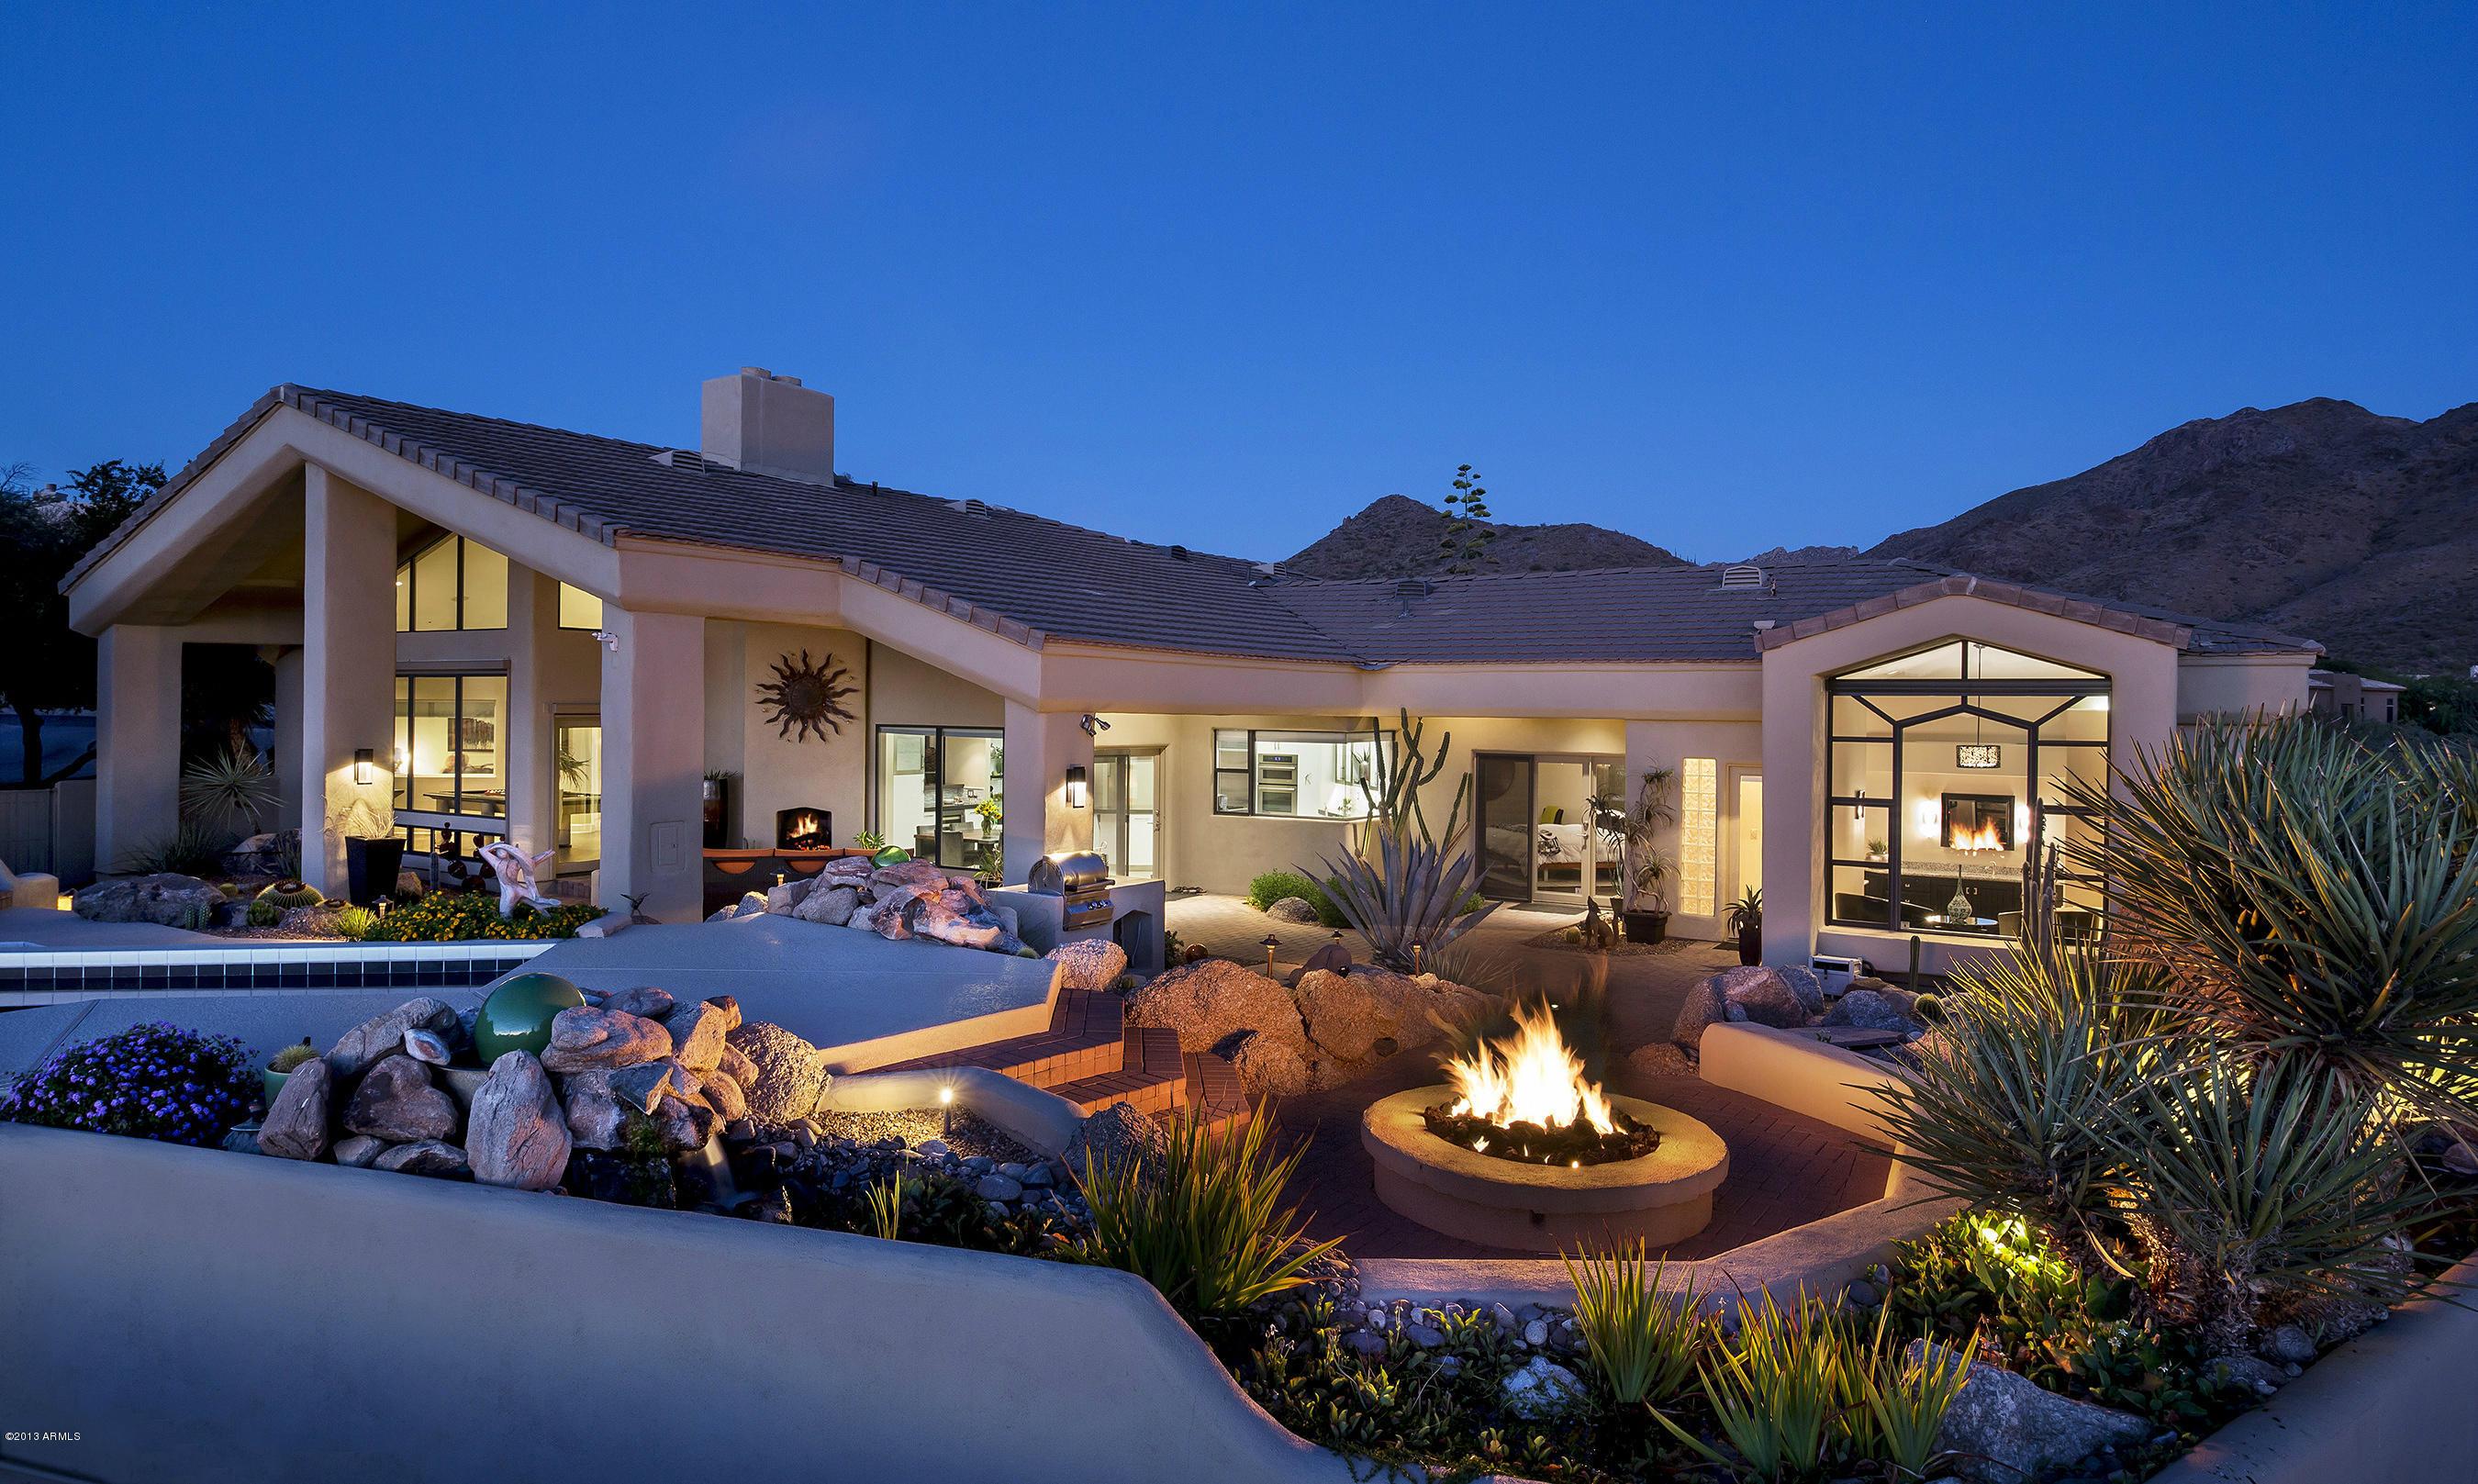 Fireplace and outdoor living in Scottsdale AZ, Troon neighborhood